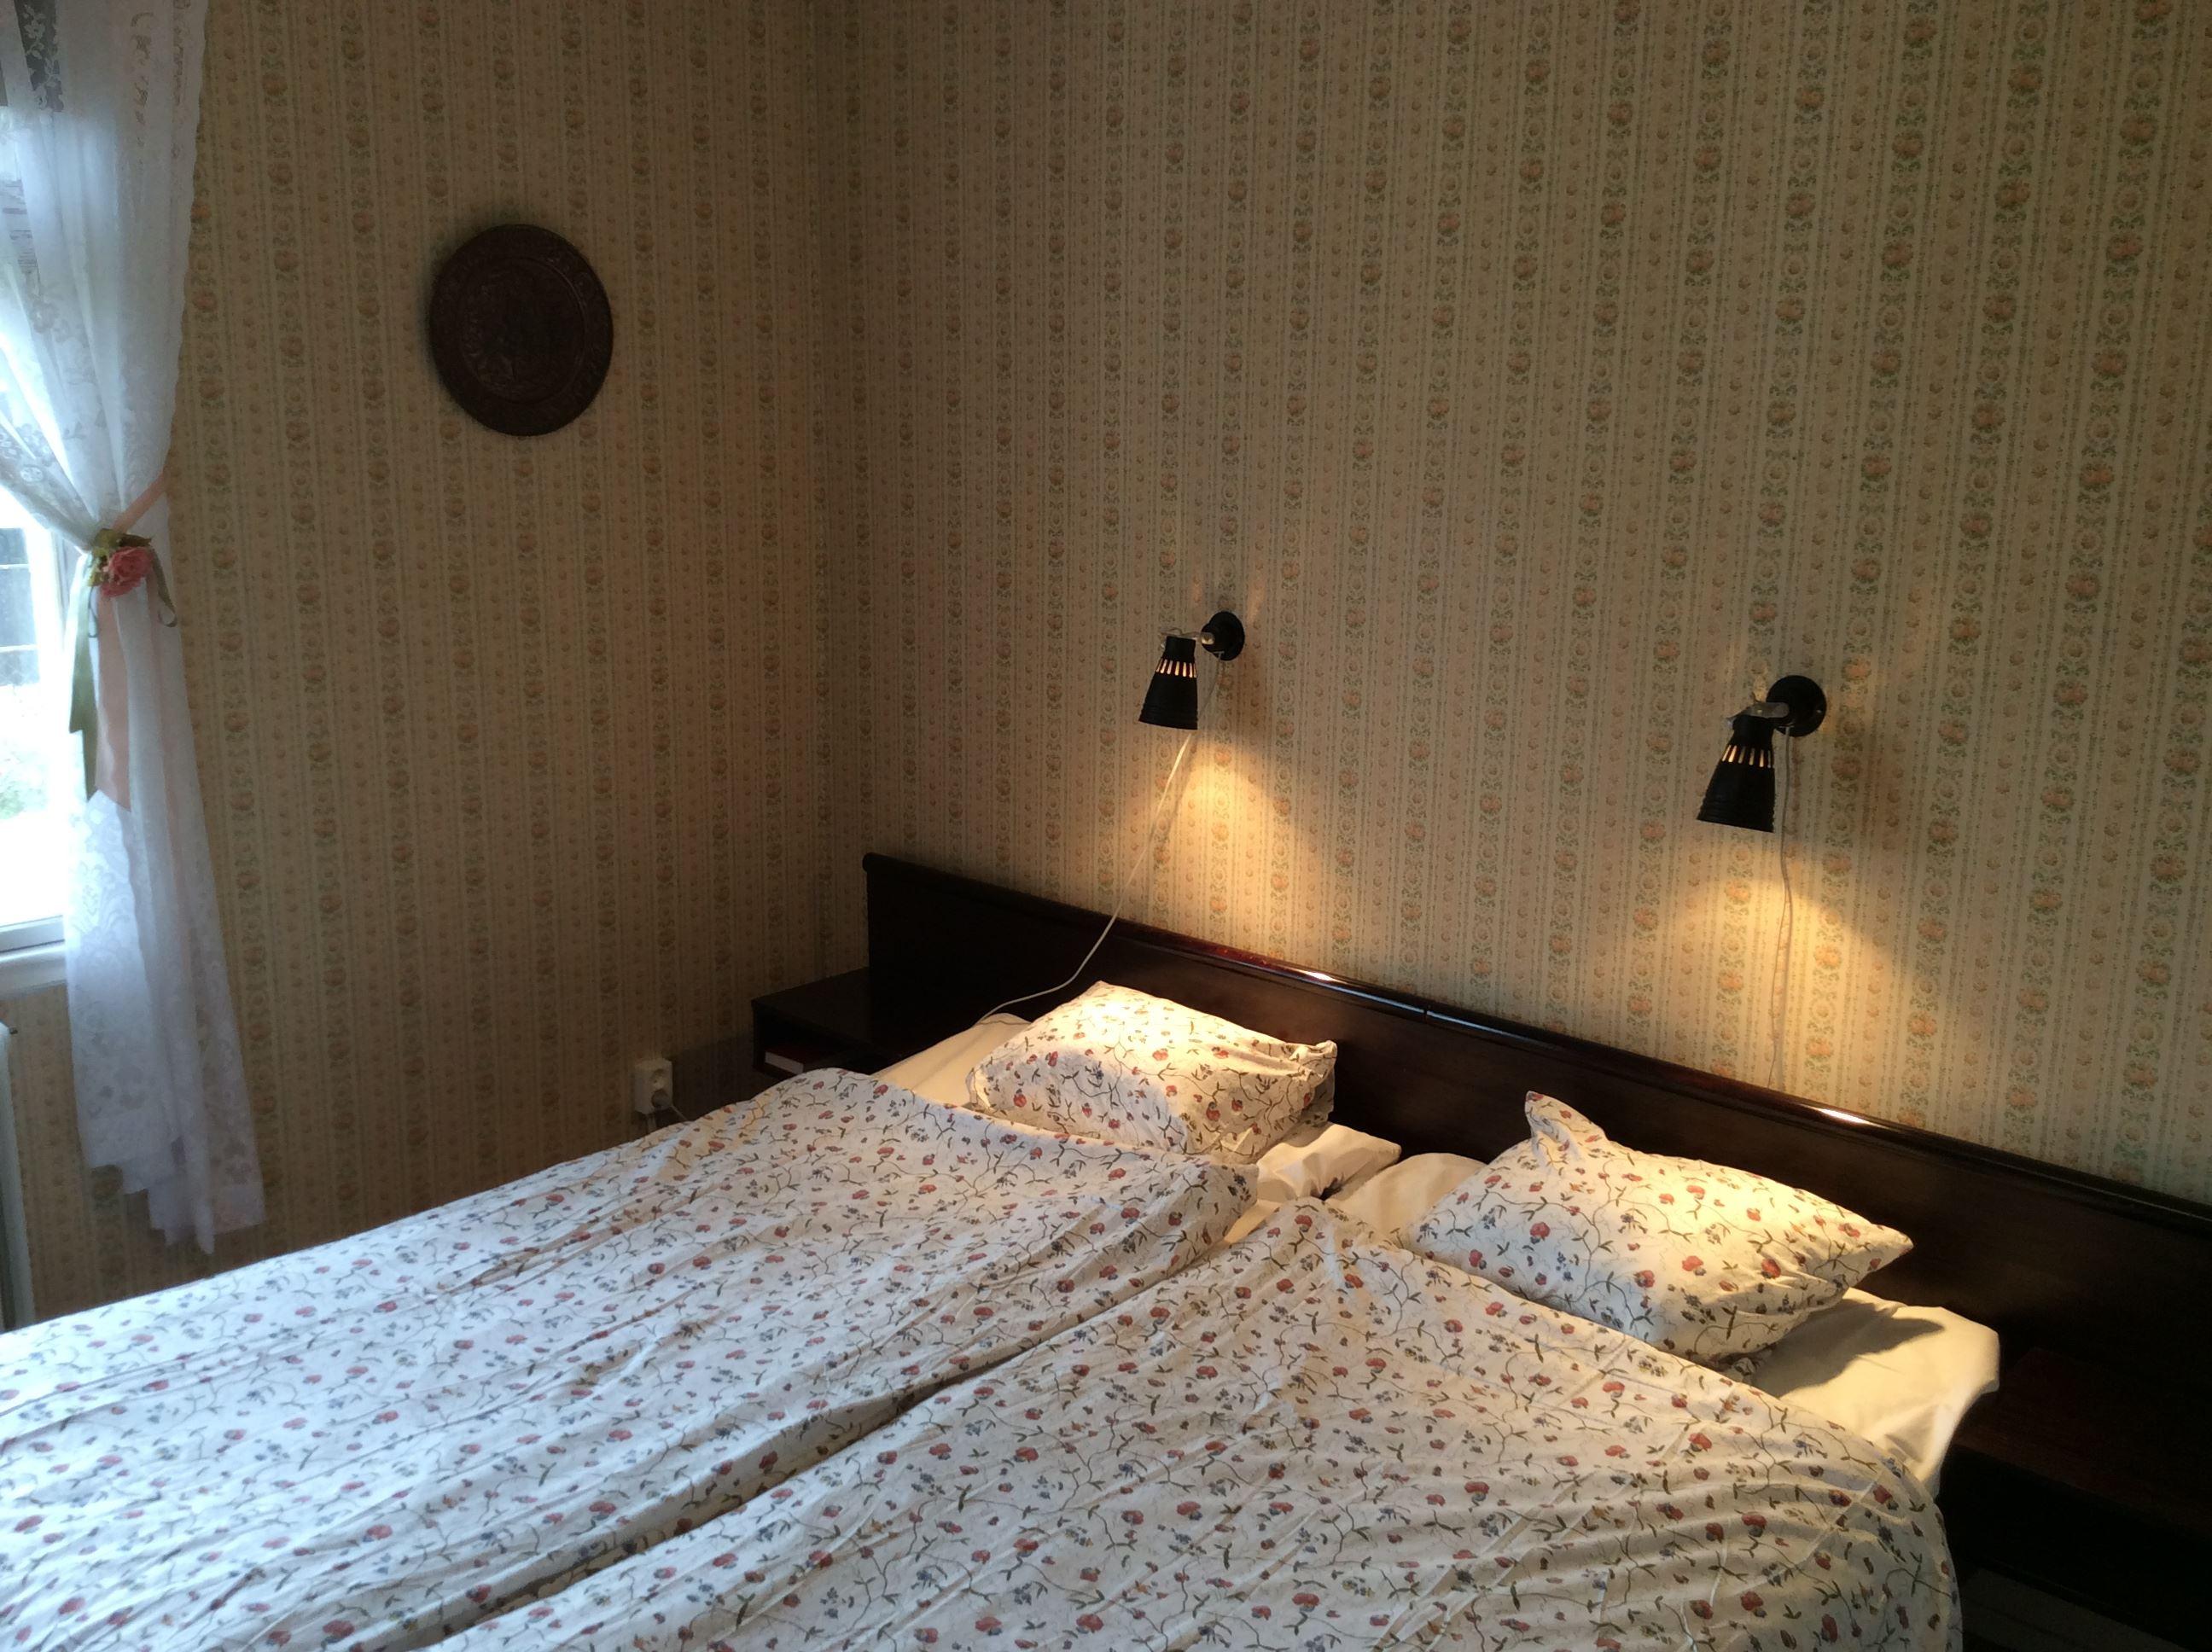 © Urshults hotell B&B, Urshult Hotell B & B